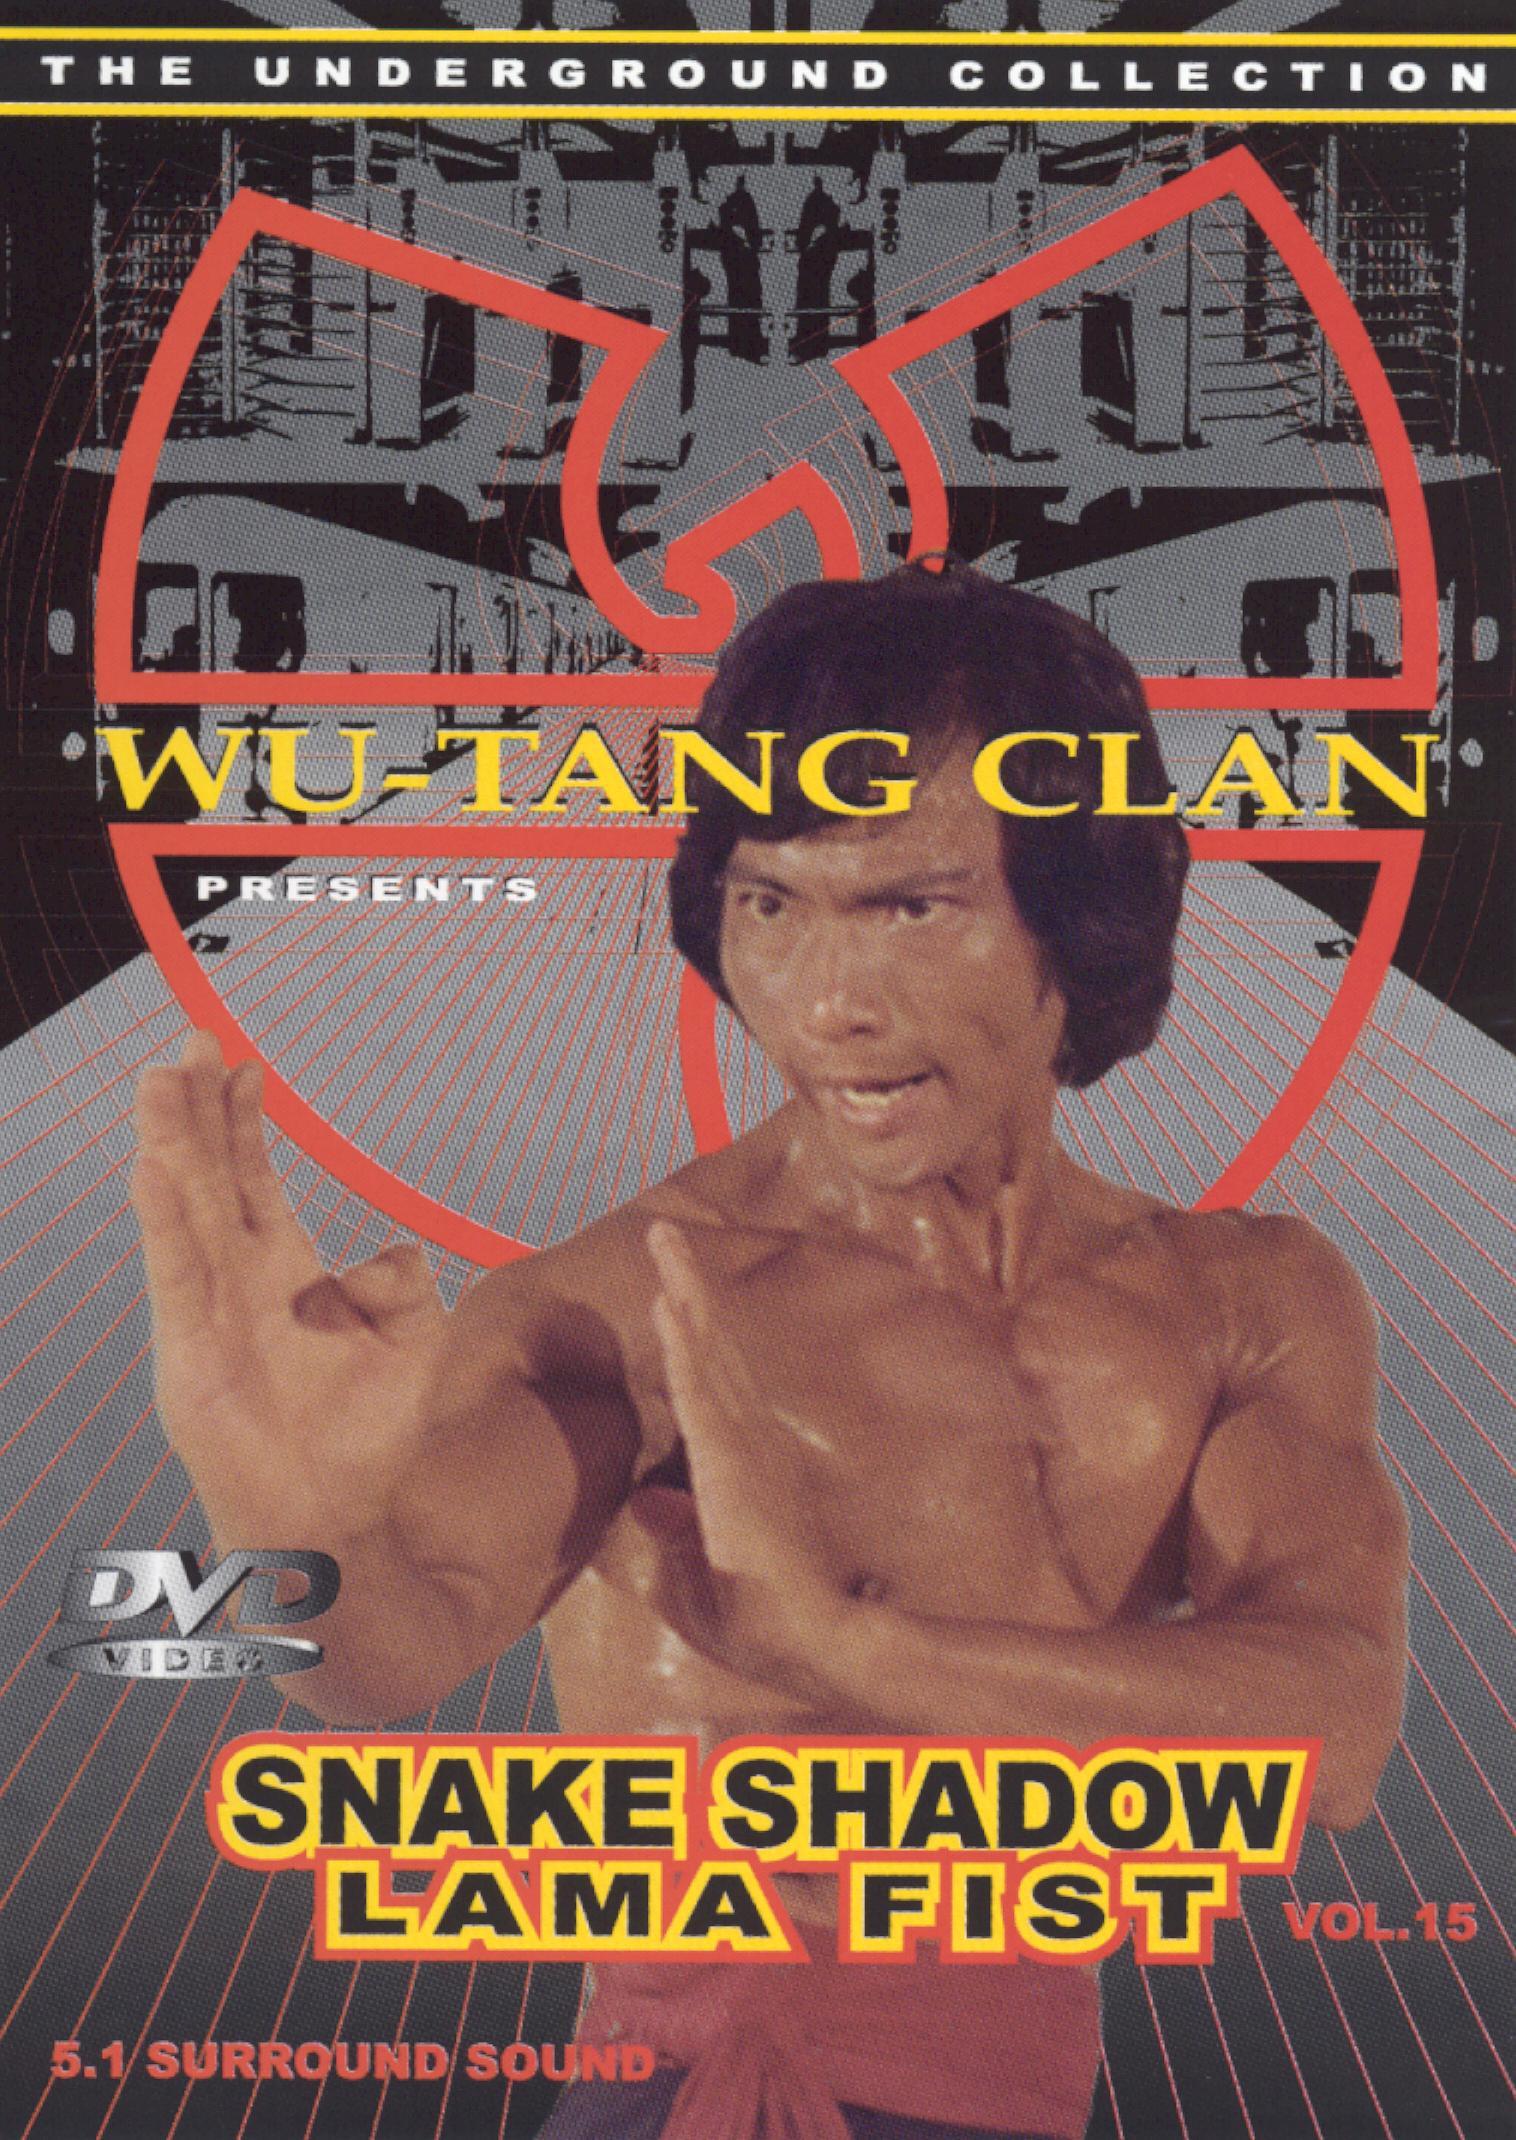 Snake Shadow Lama Fist